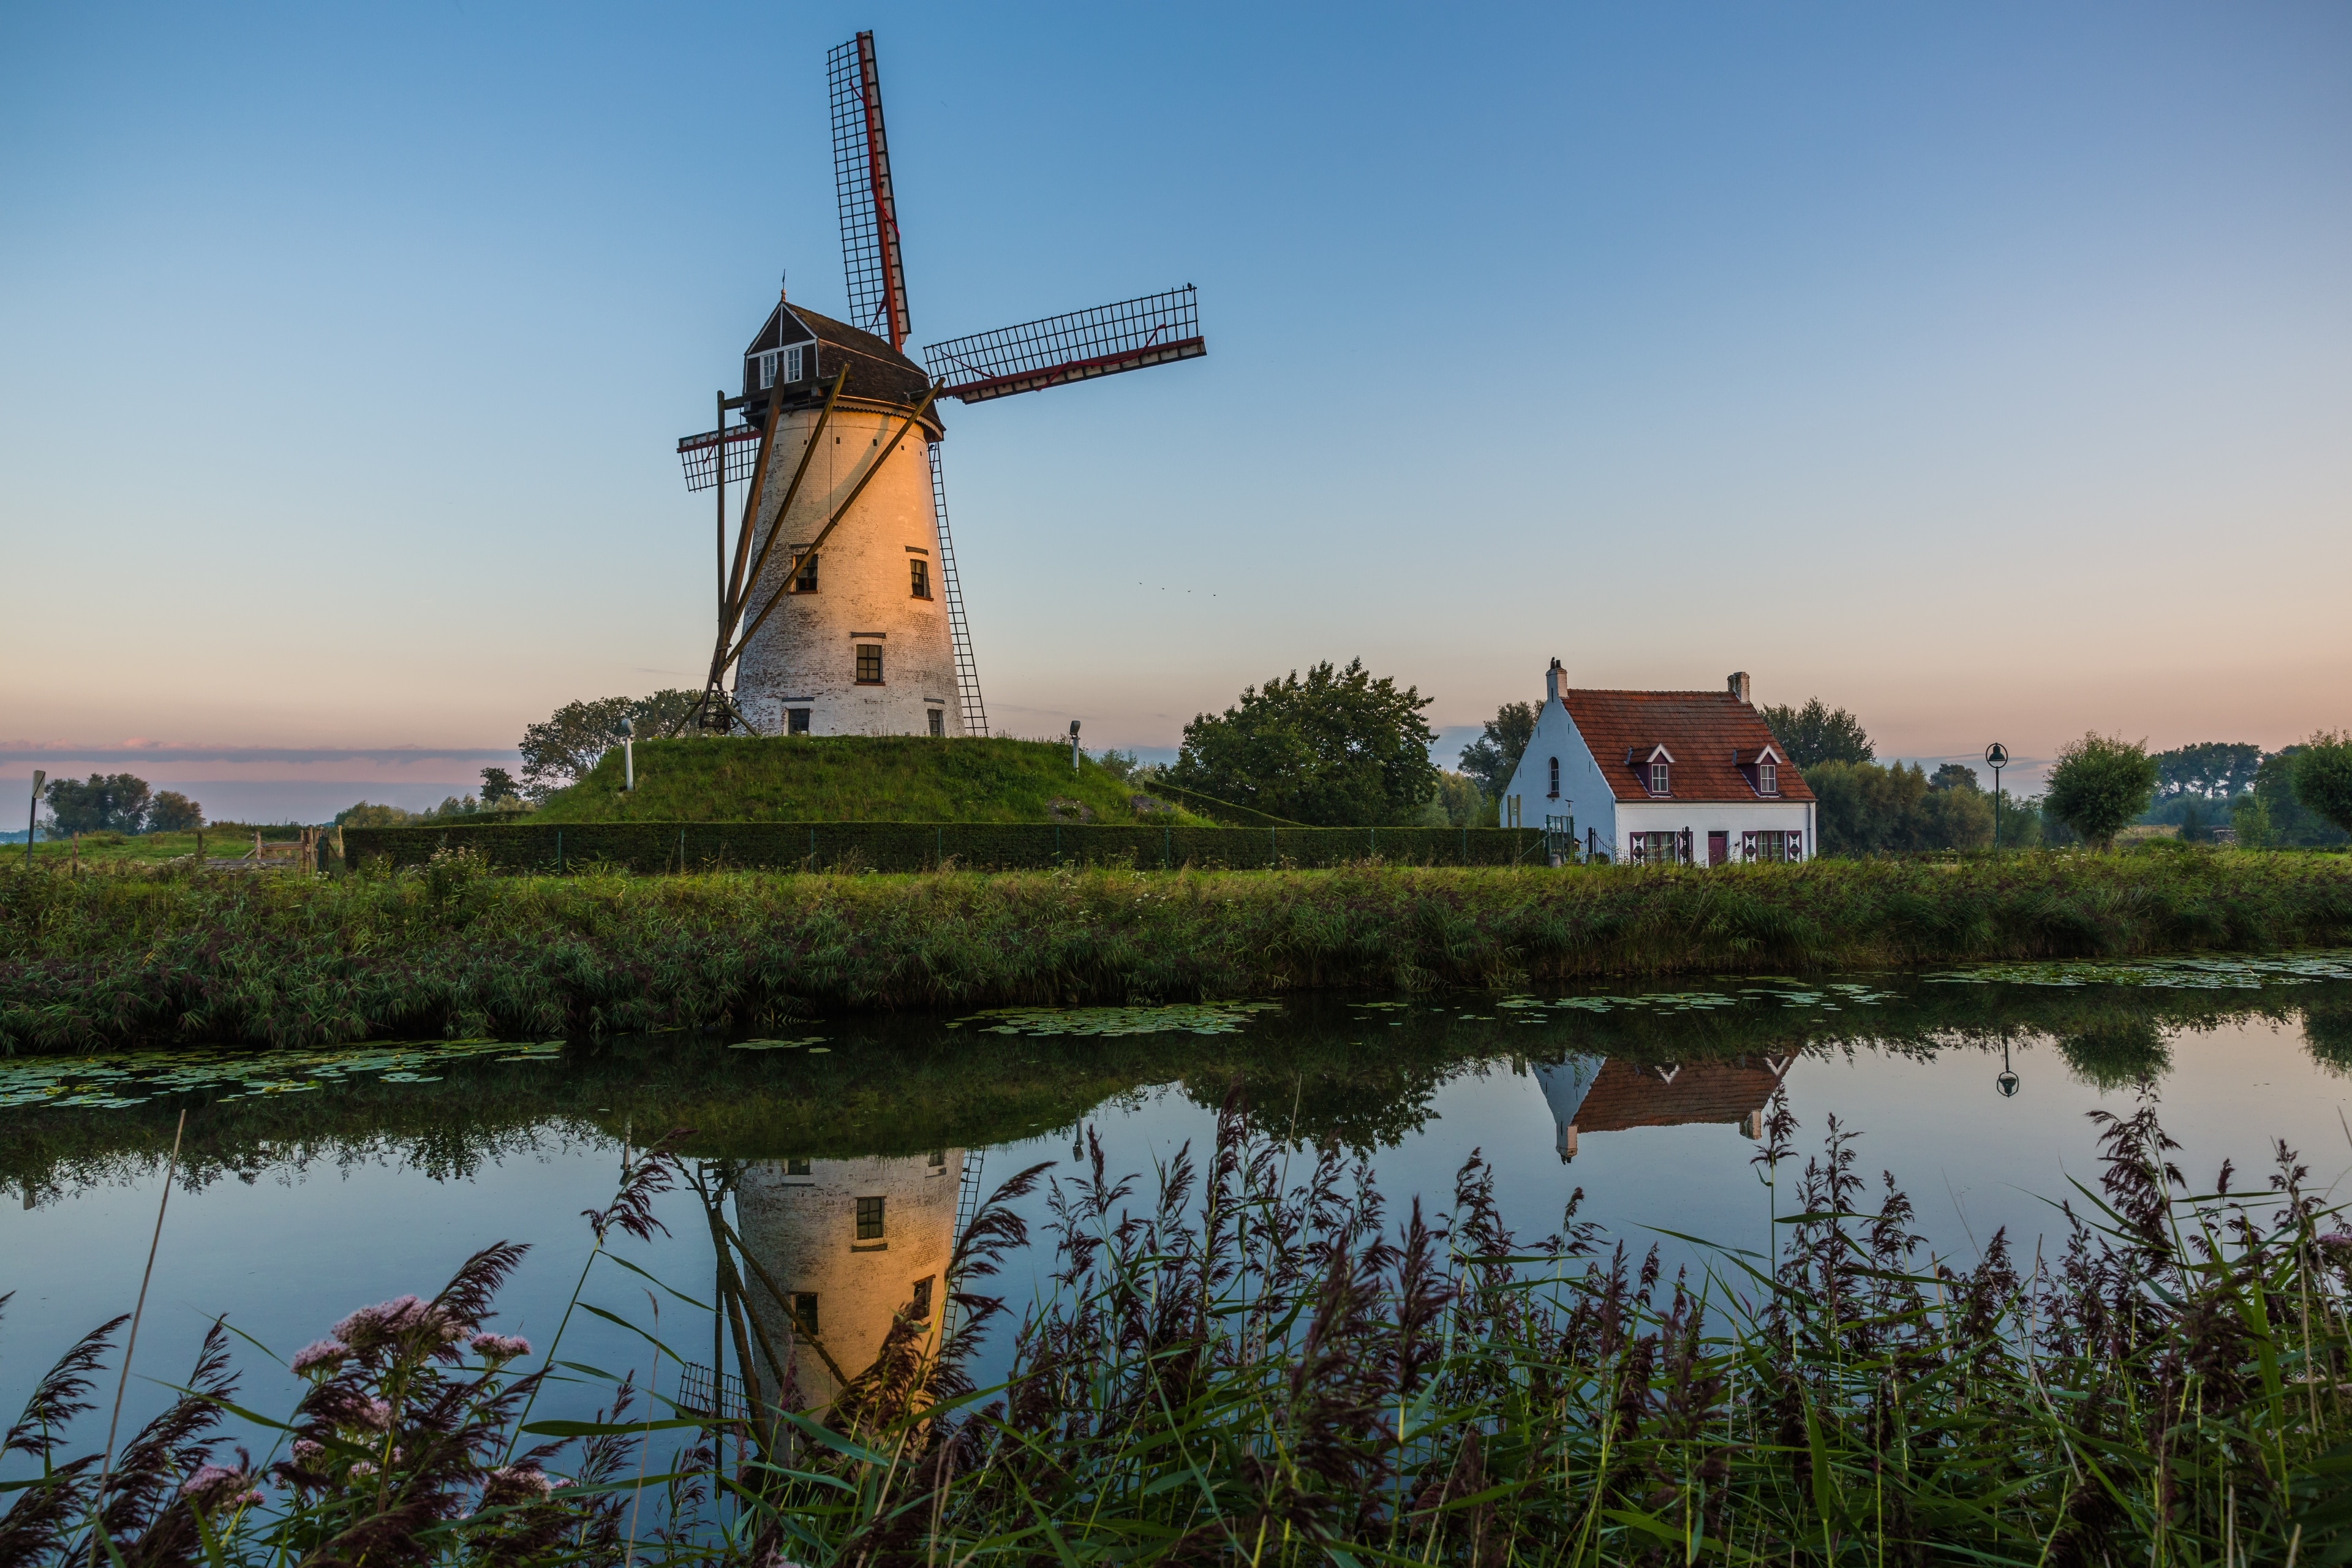 Hoeke Windmill, Damme, Flemish Region, Belgium